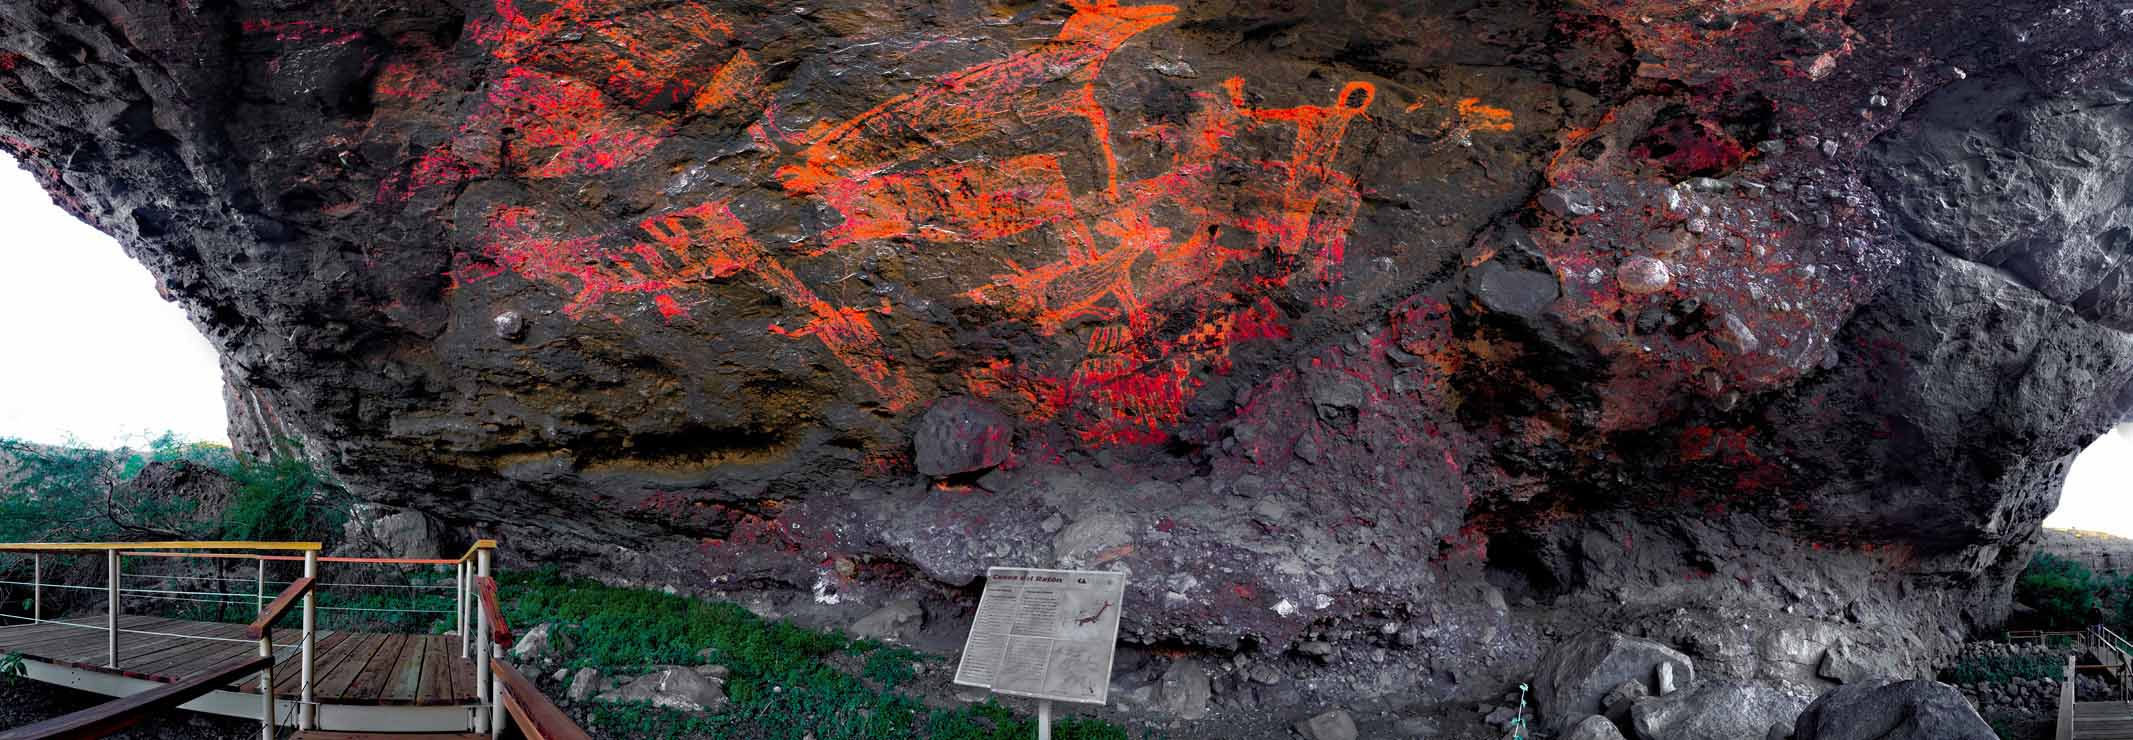 Rock paintings in Sierra de San Francisco 2